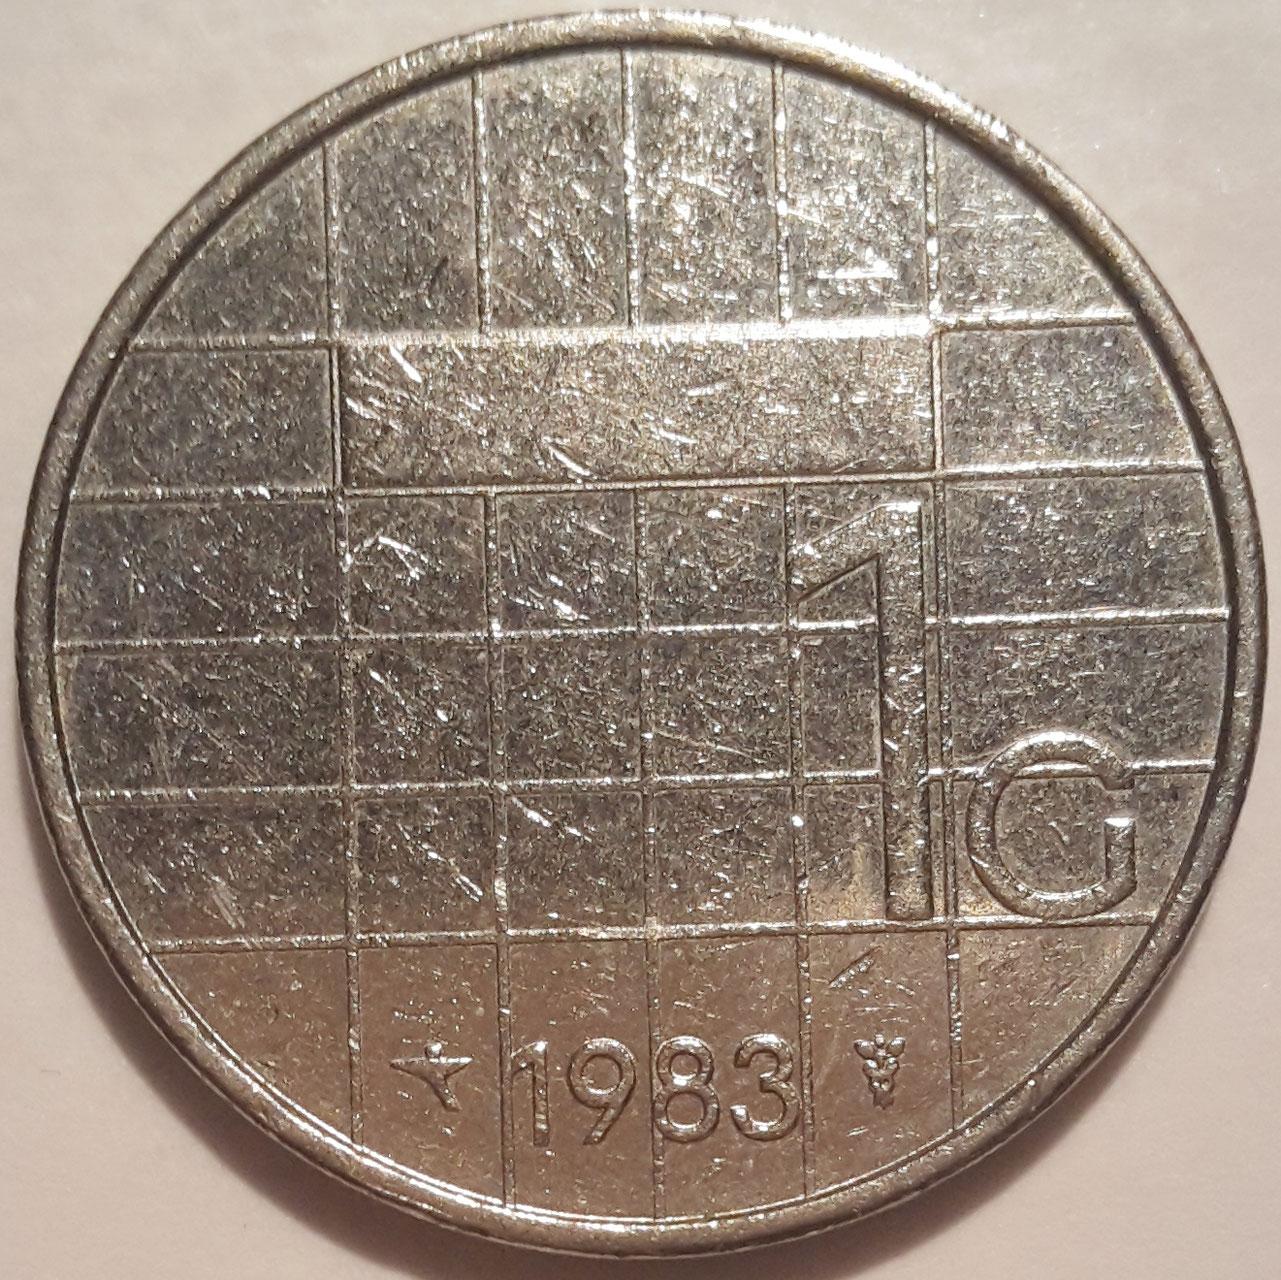 Netherlands 1982-2001